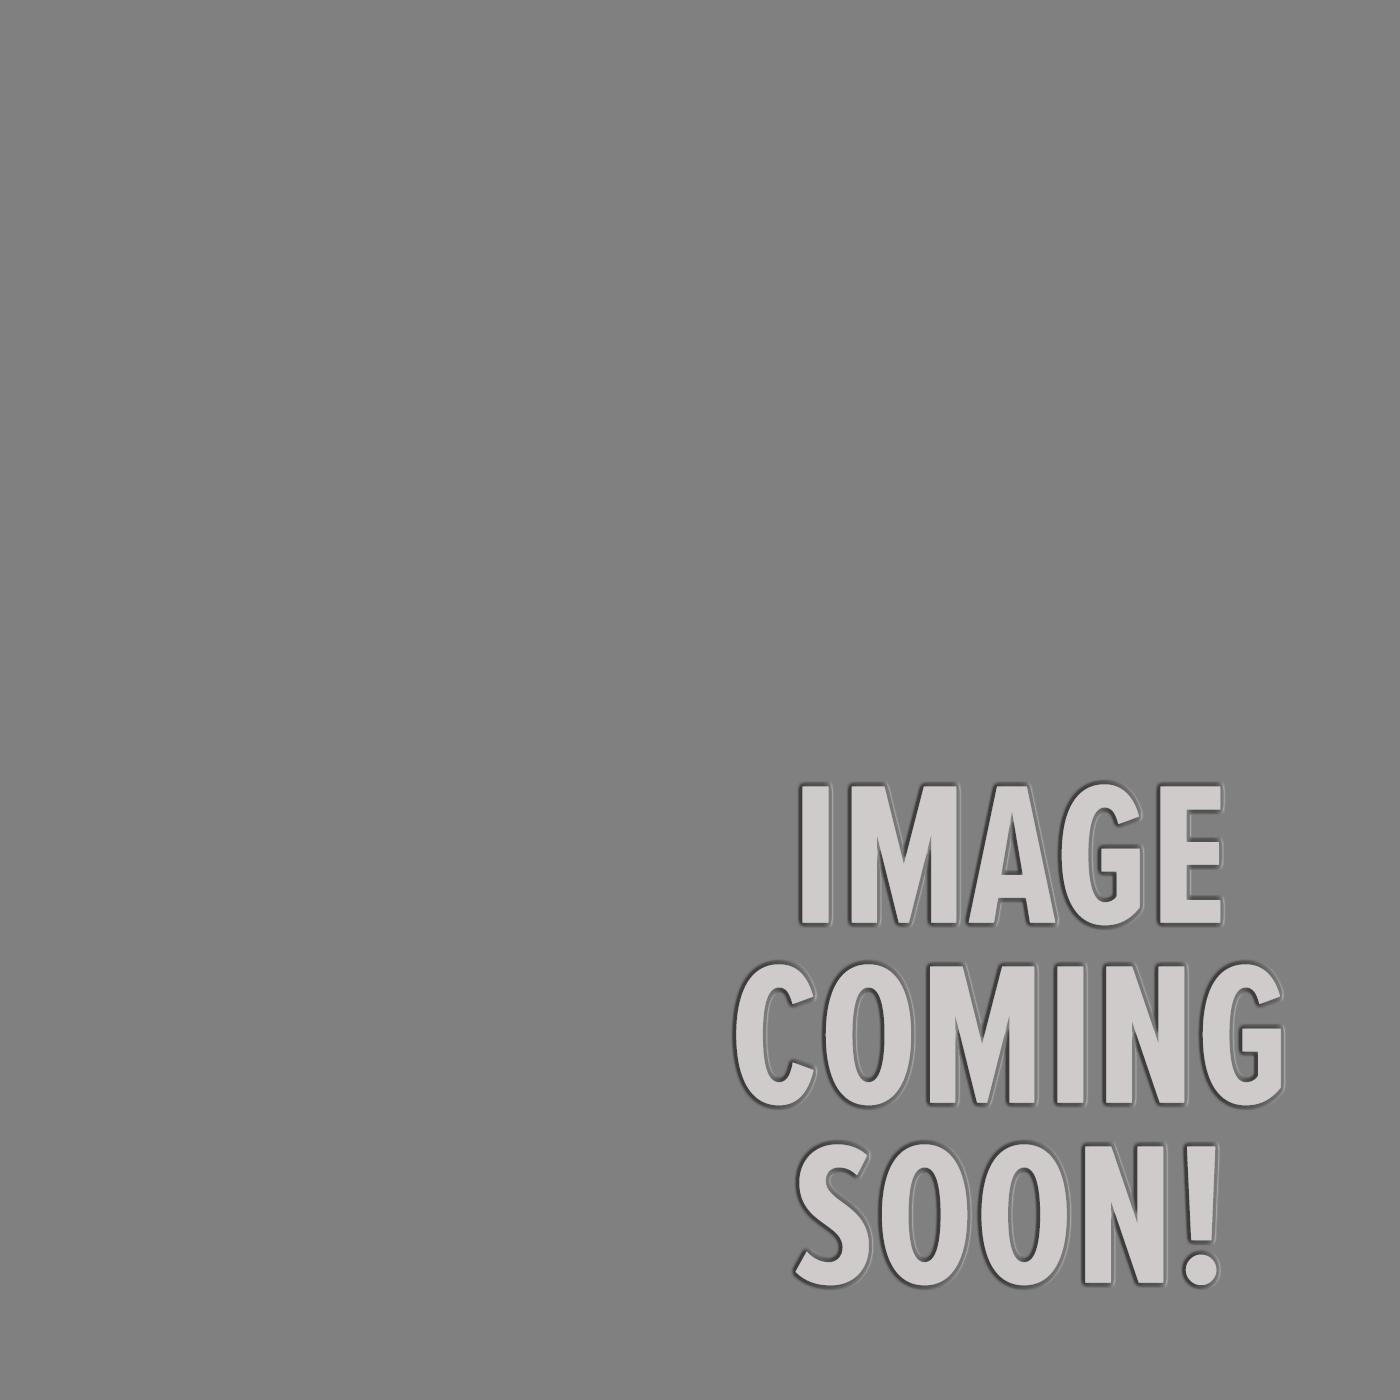 Image for GC1 Nylon-String Left-Handed Acoustic Guitar from SamAsh